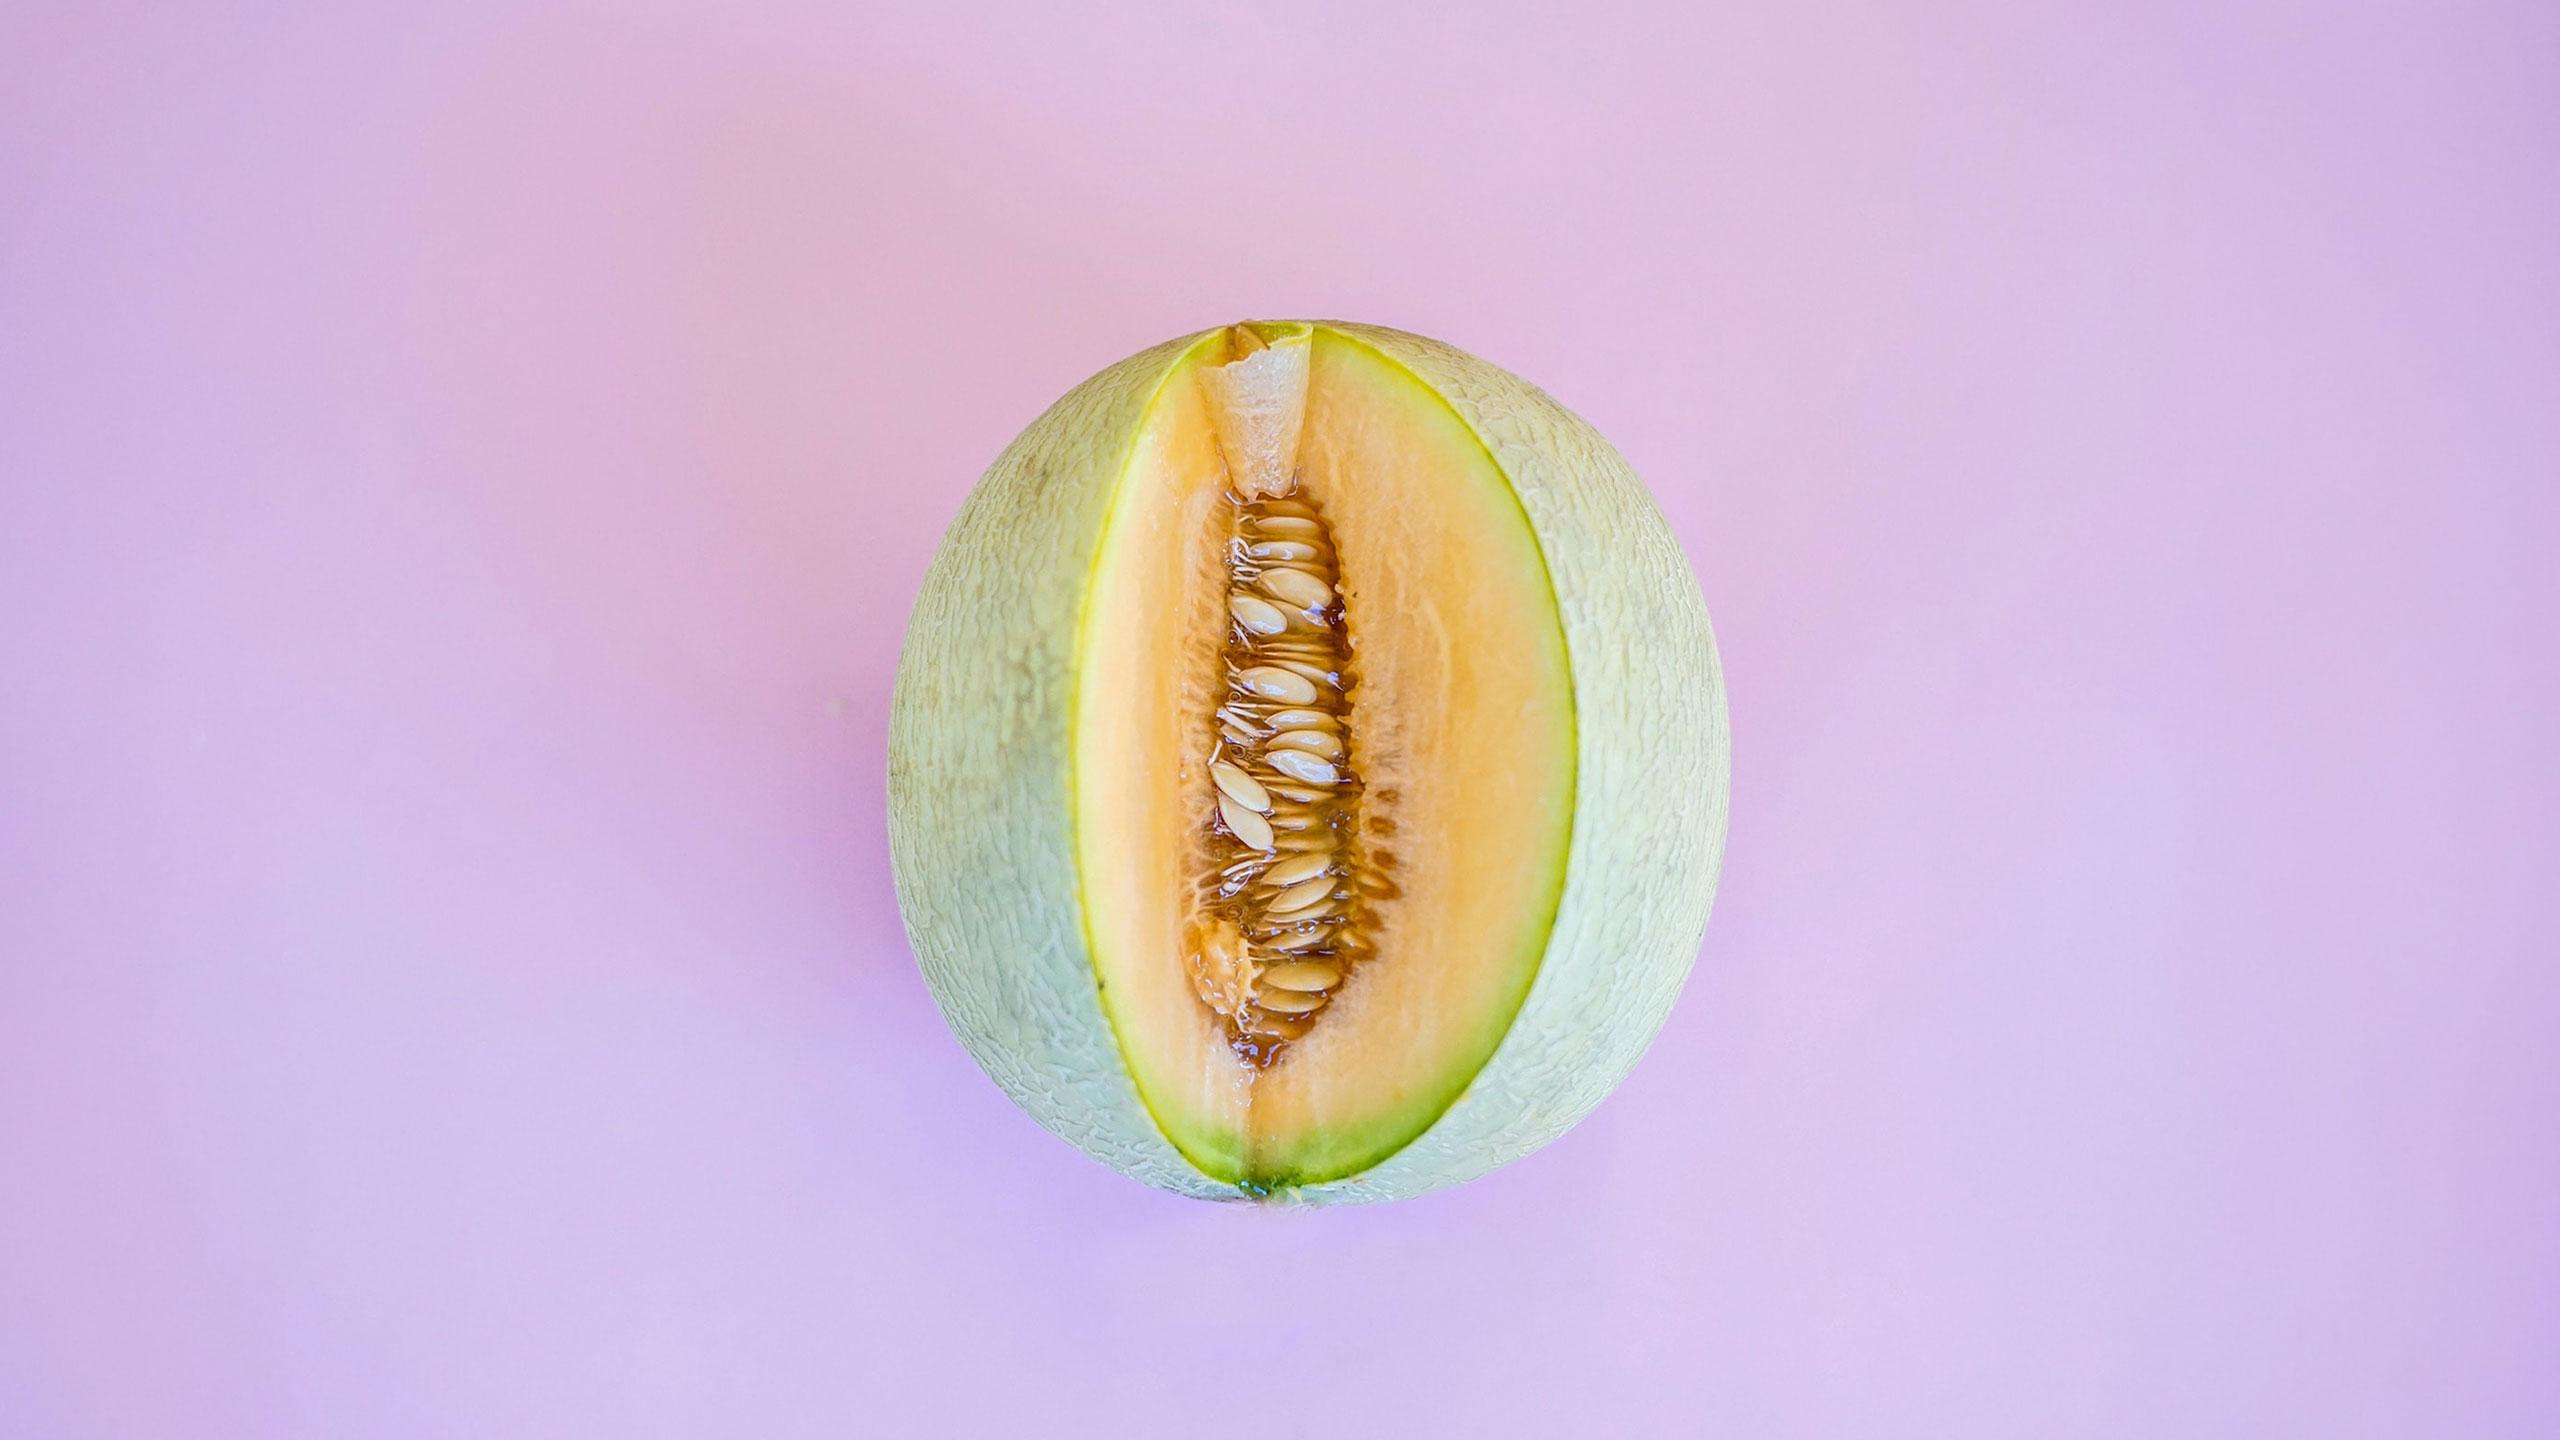 melon-mas-costoso